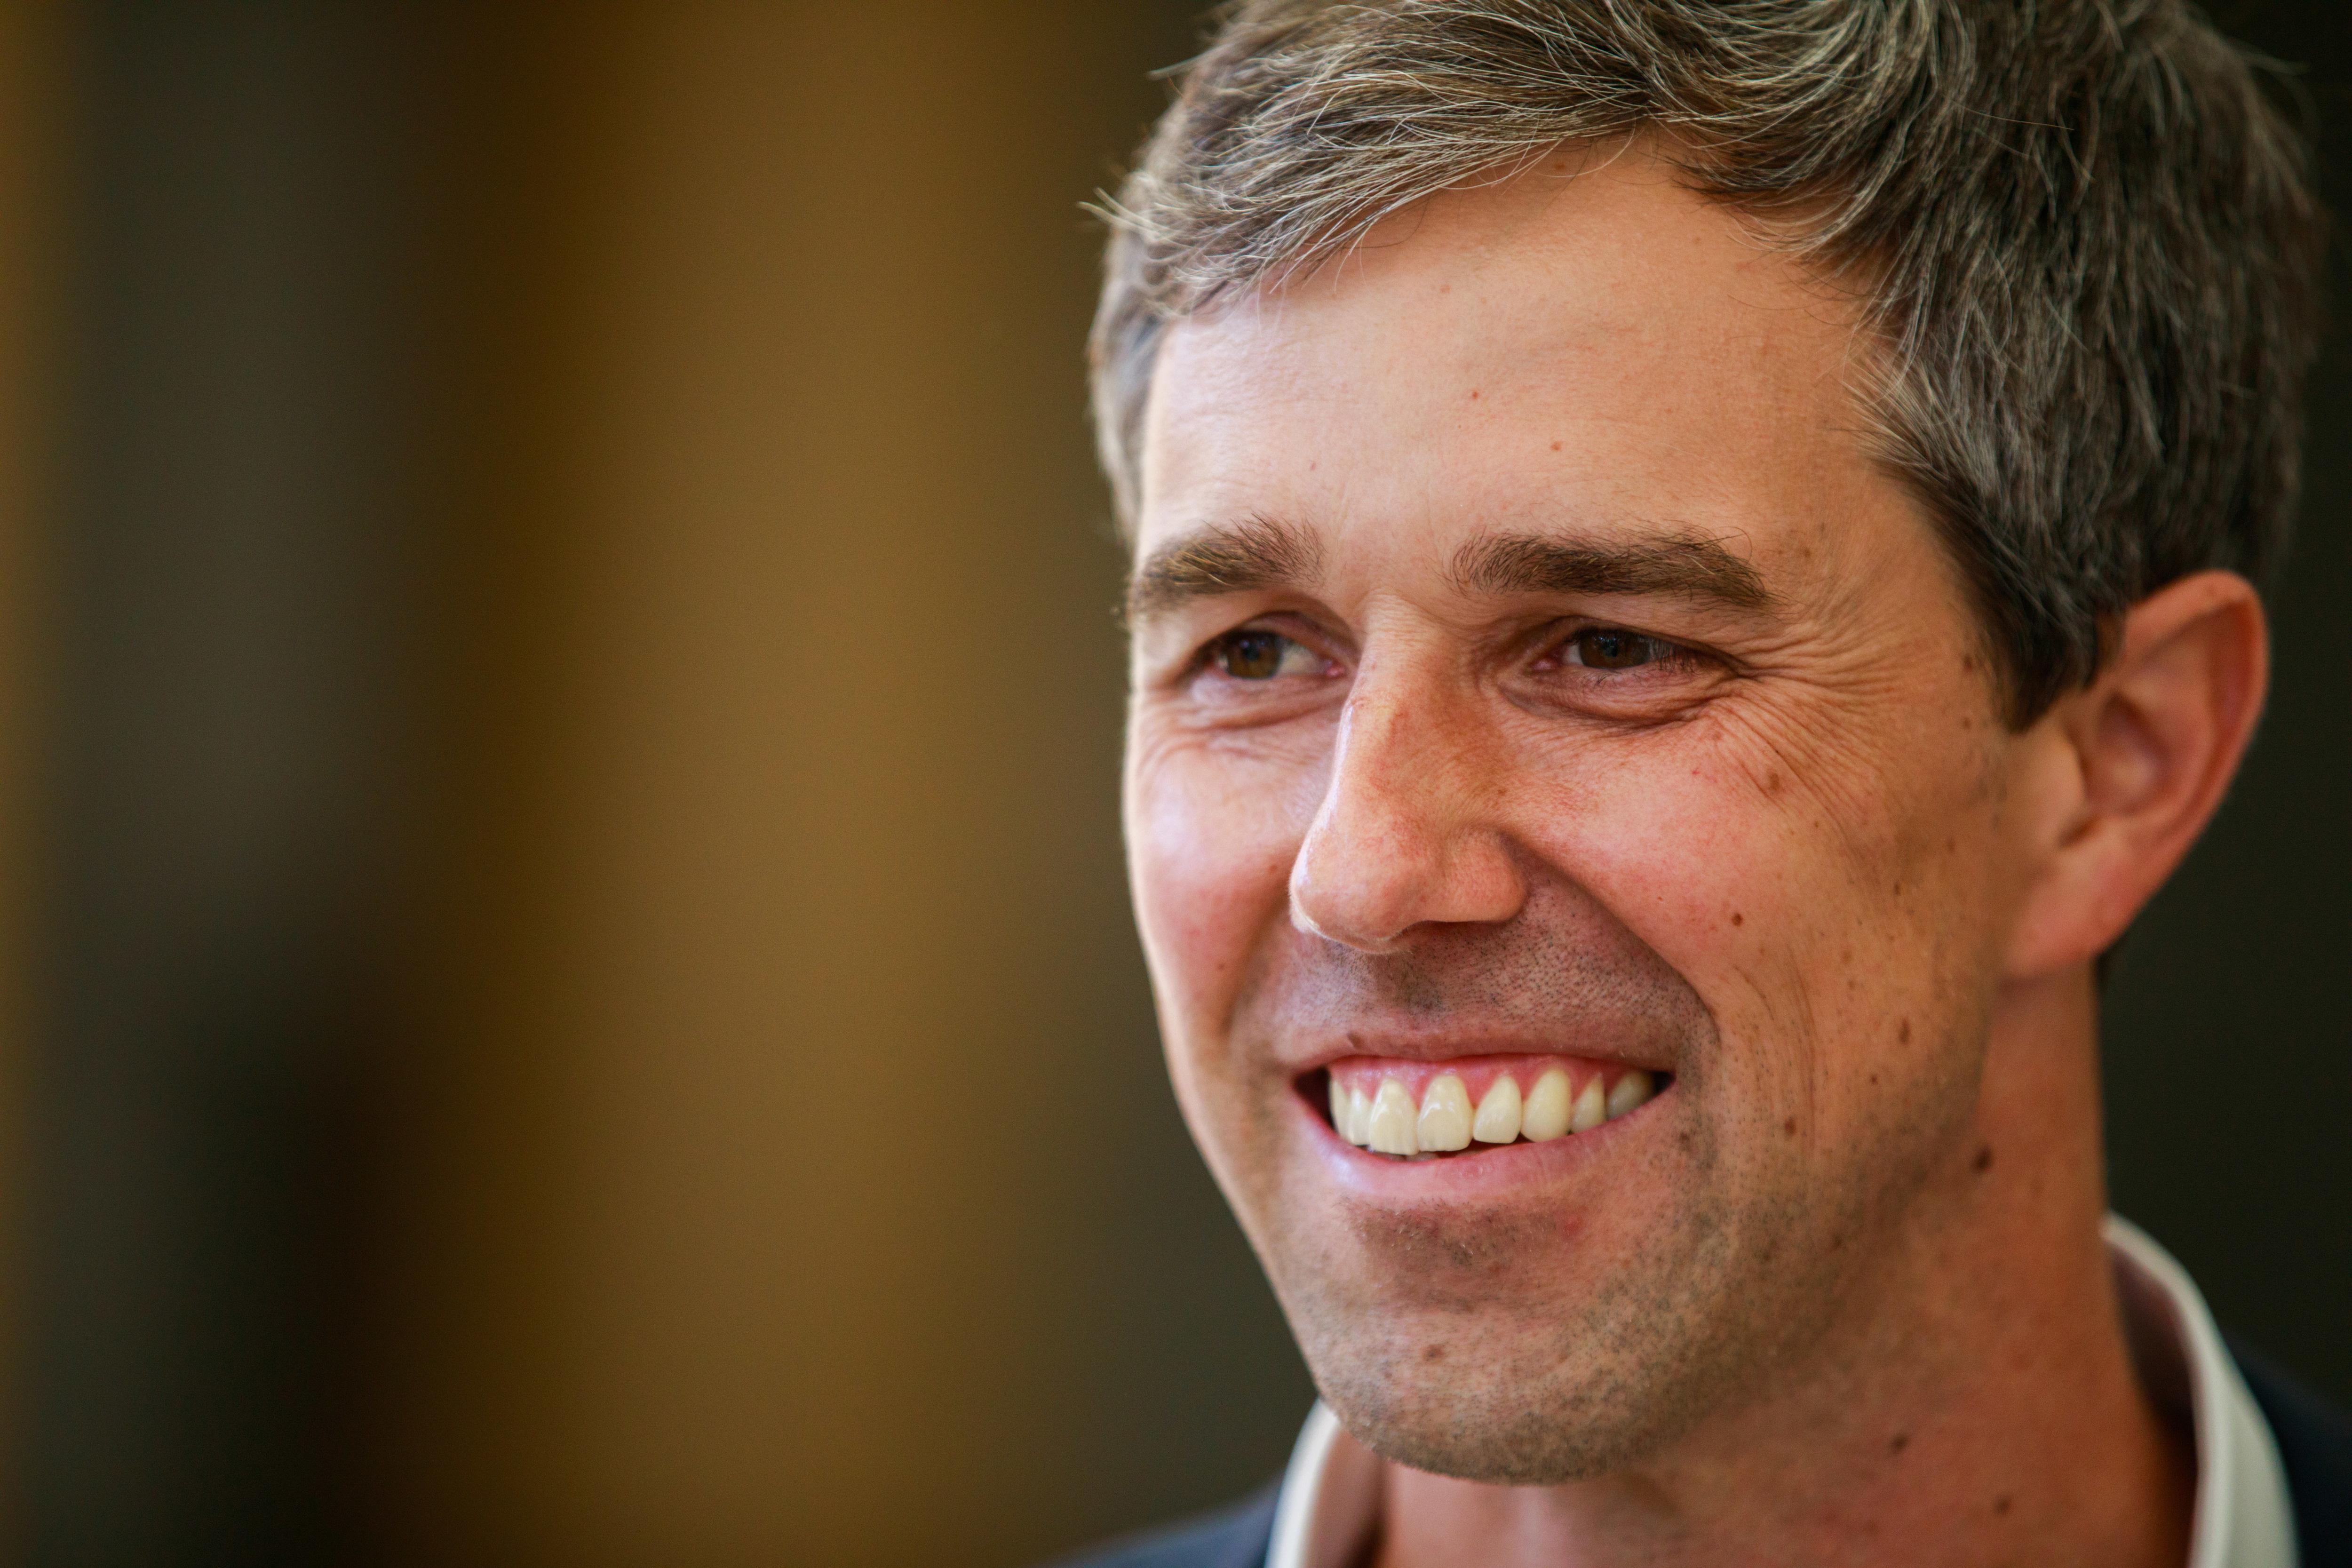 Democratic presidential hopeful Beto O'Rourke speaks to